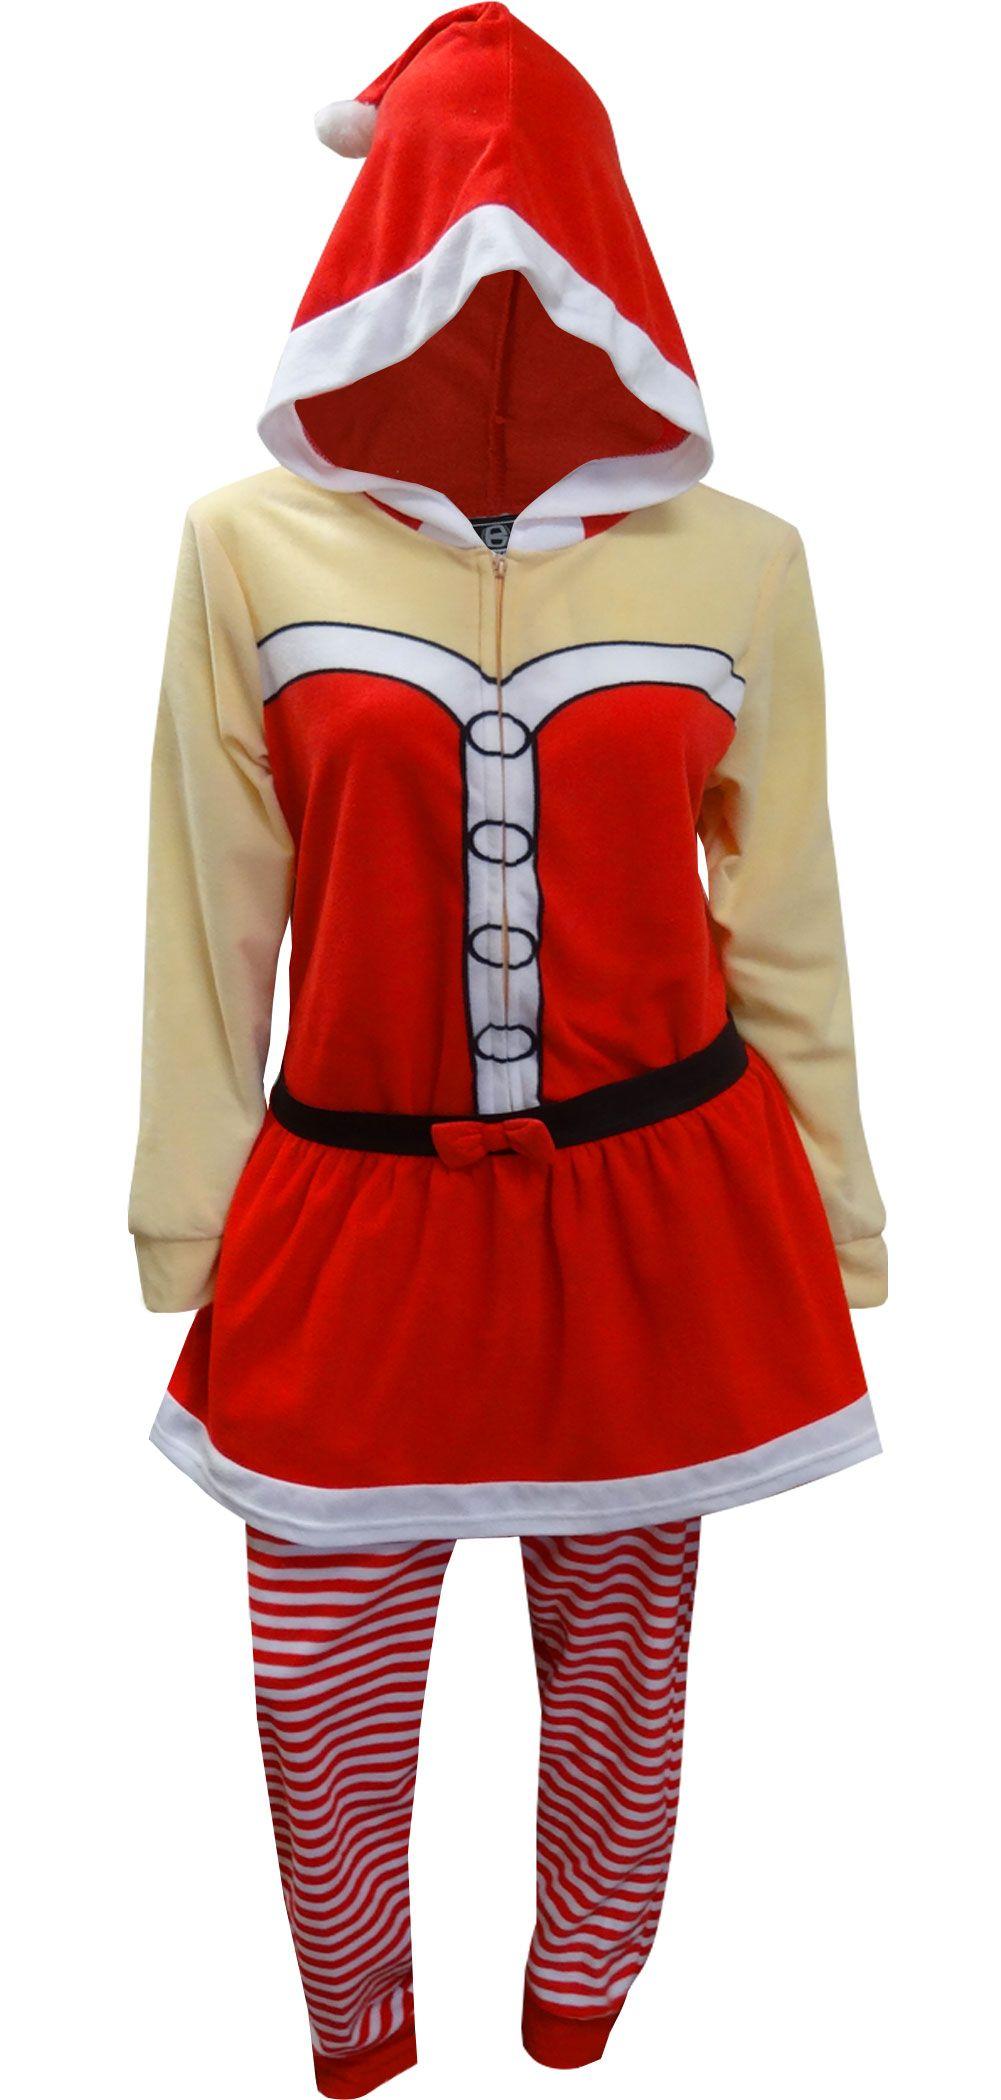 WebUndies.com Mrs Santa Claus One Piece Hooded Skirted Union Suit Pajama d635d4ed8